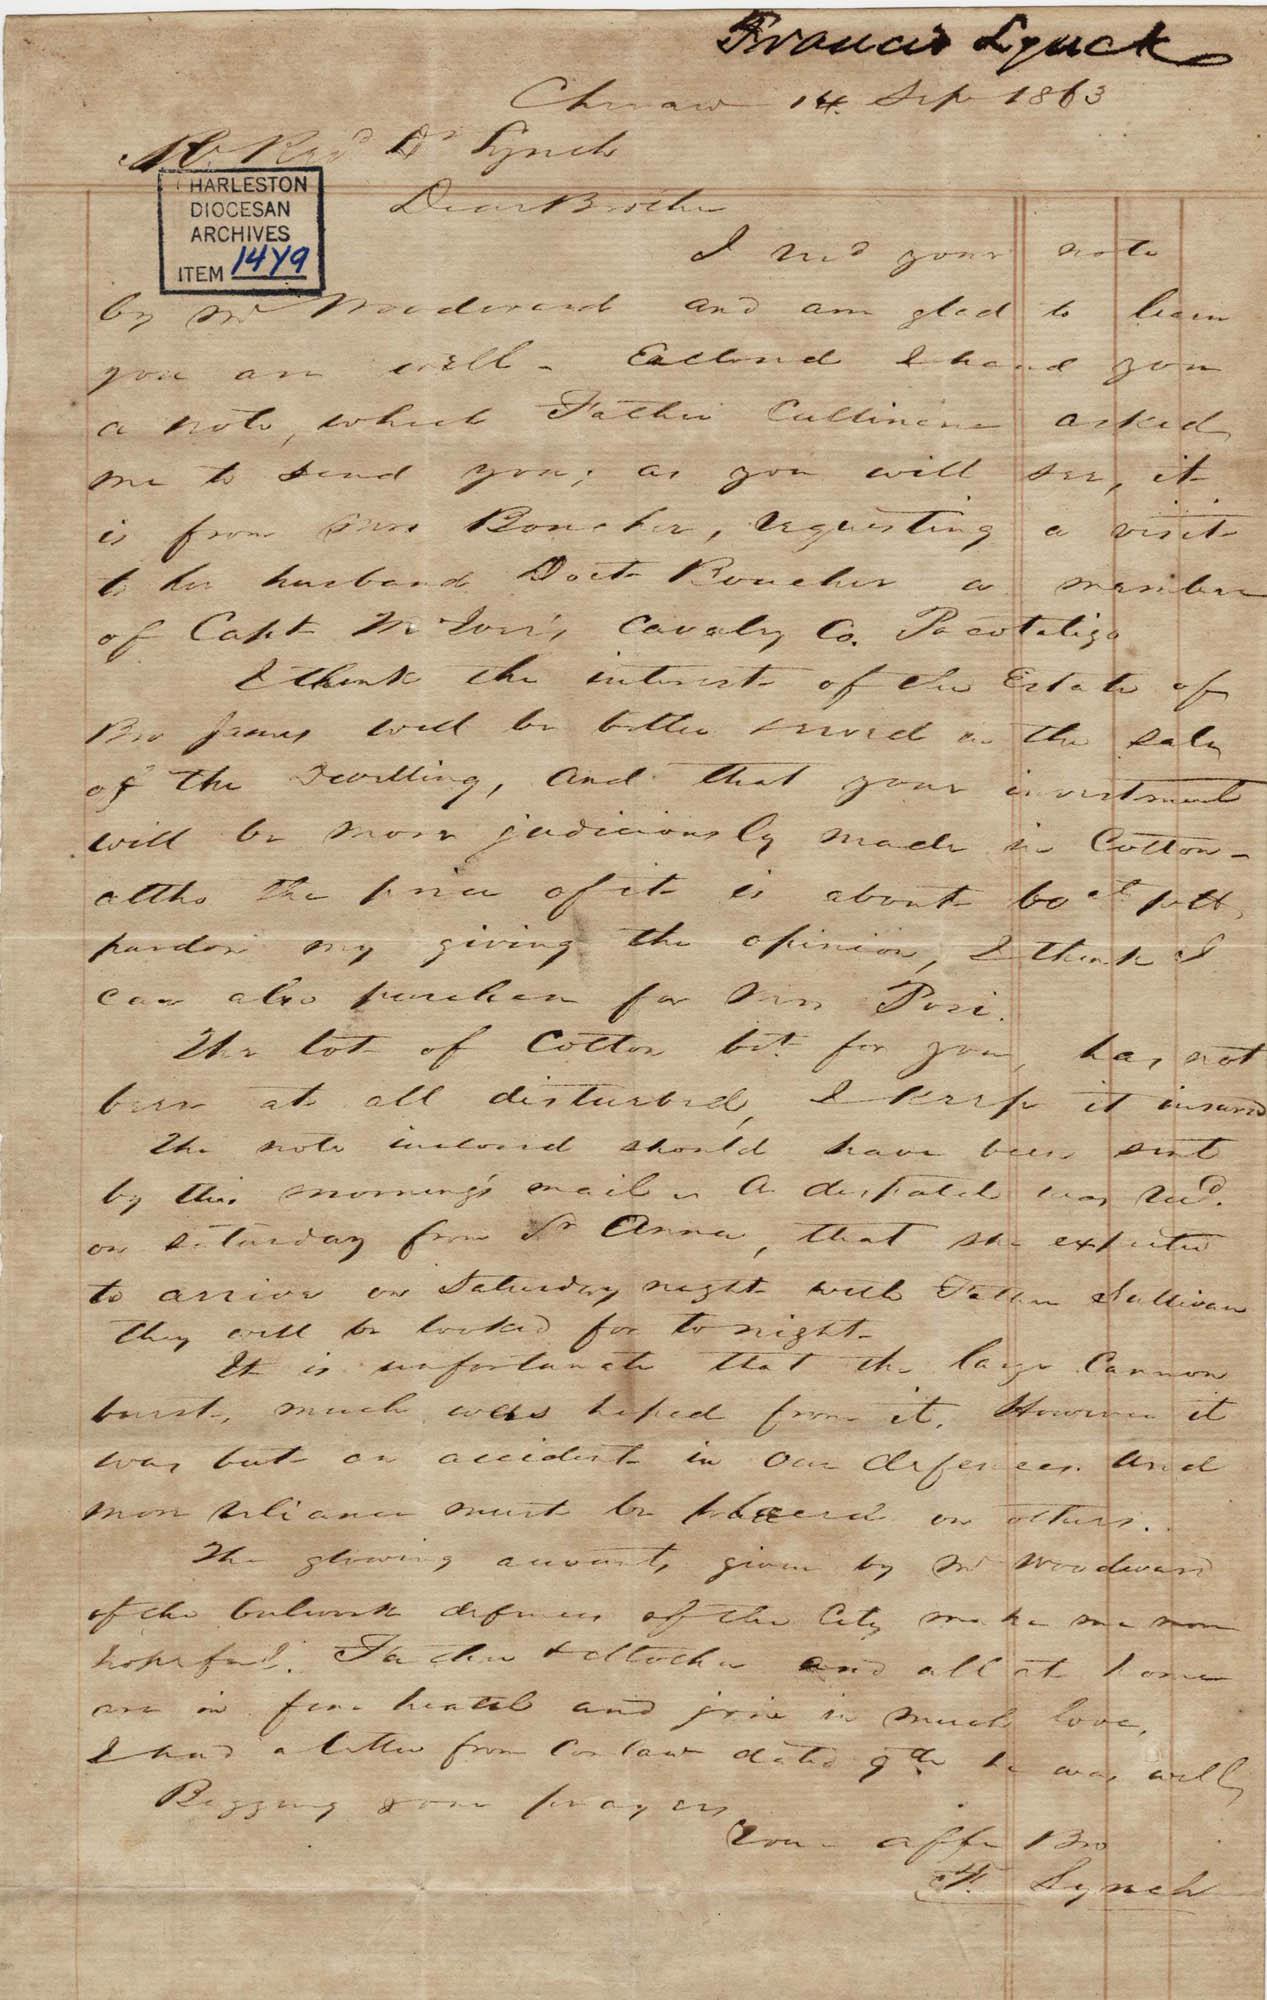 305. Francis Lynch to Bp Patrick Lynch -- September 14, 1863